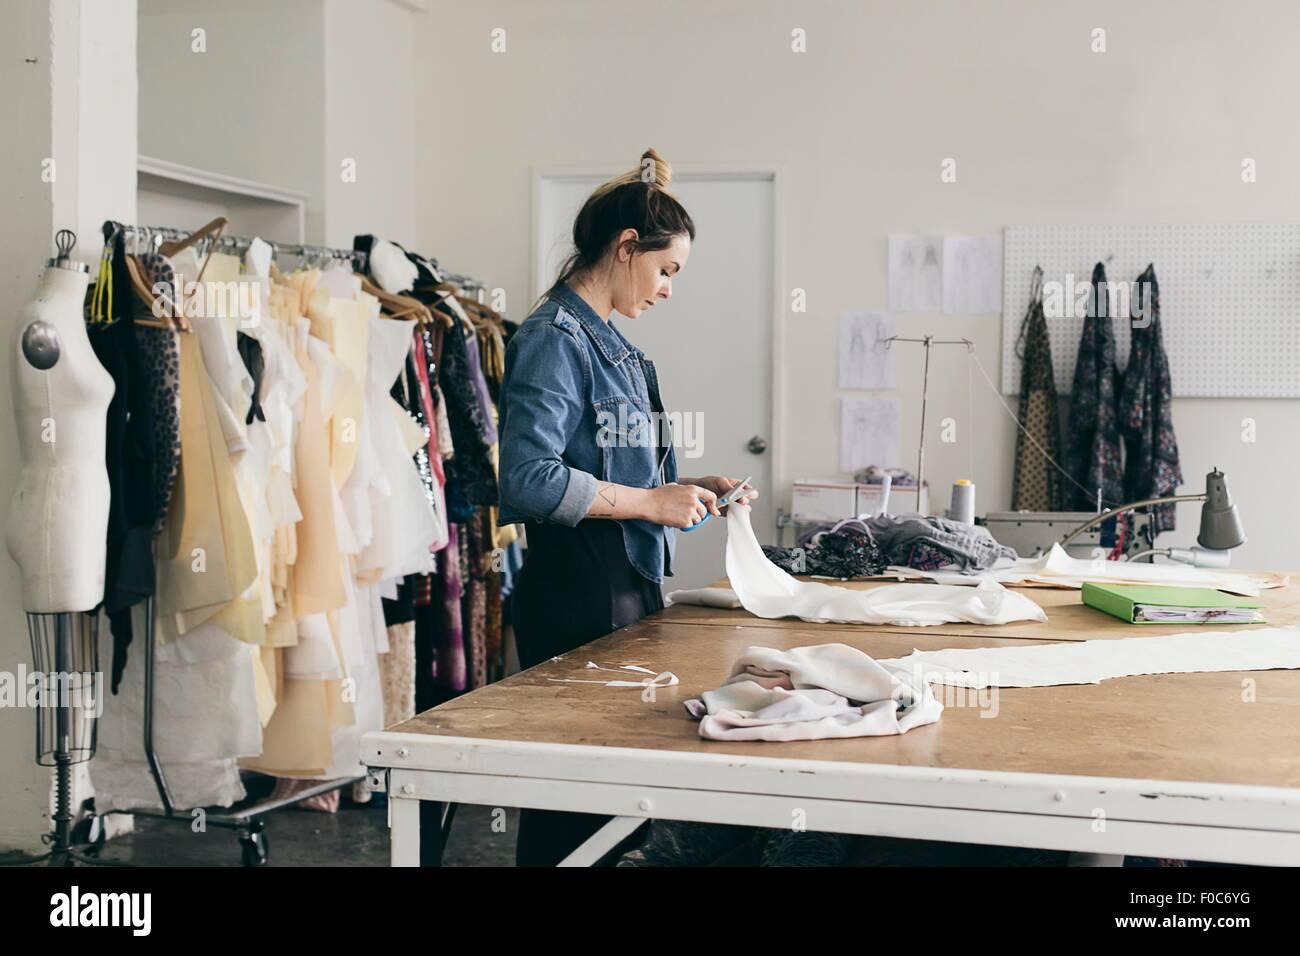 Pattern Cutting Fashion Stockfotos & Pattern Cutting Fashion Bilder ...